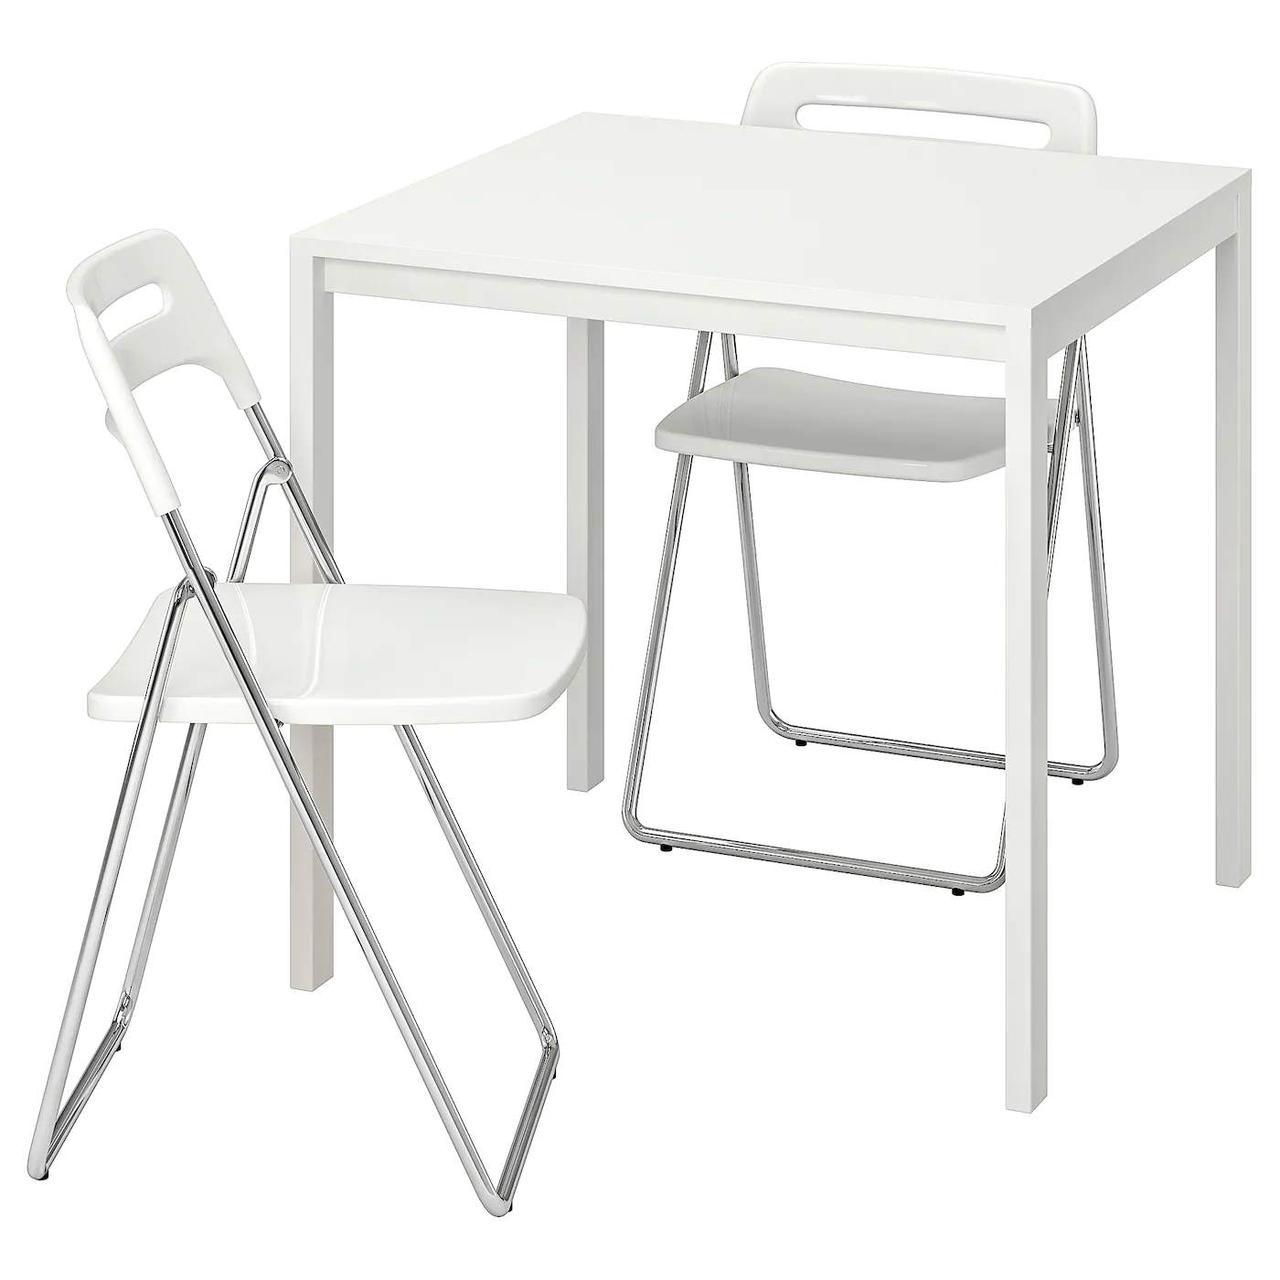 Стол и 2 стула MELLTORP / NISSE